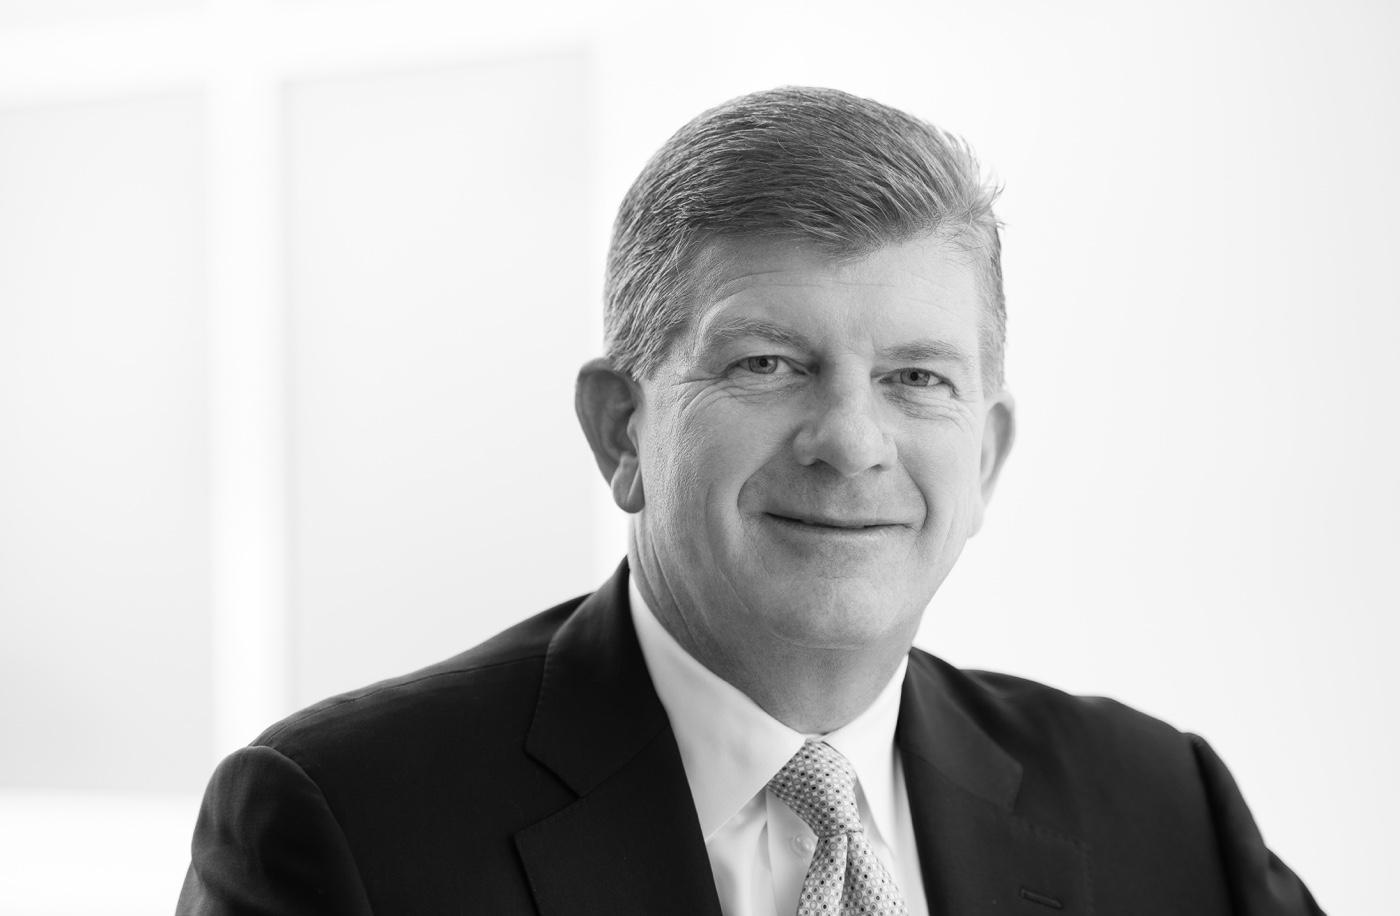 Stephen J. Donaghy